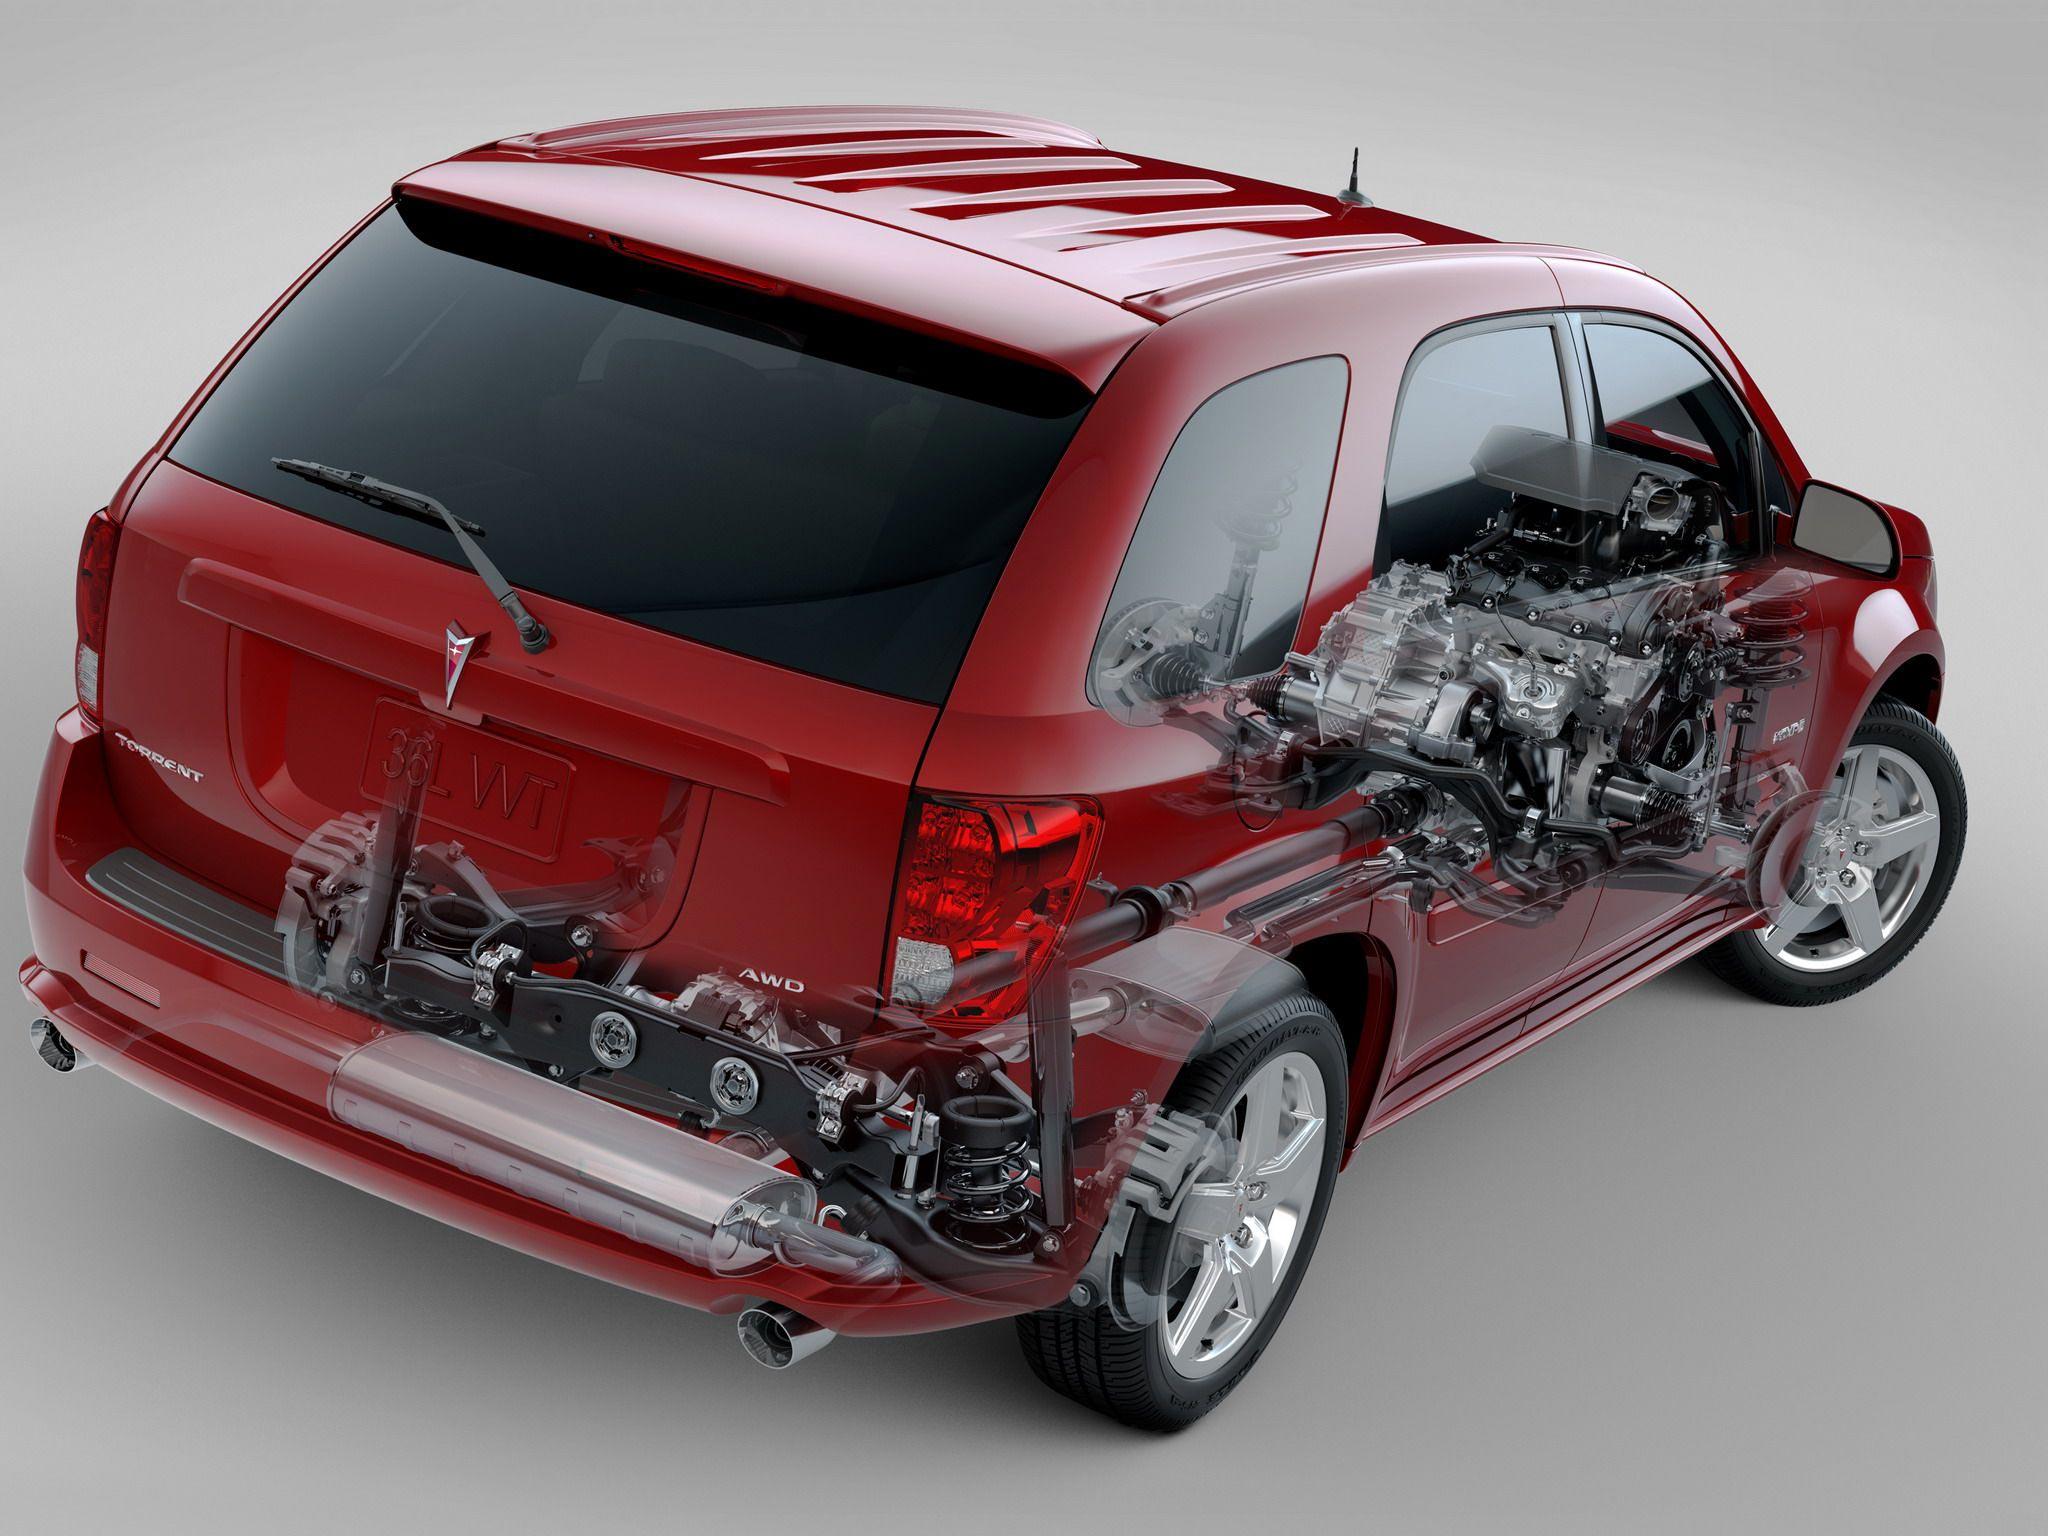 Pontiac Torrent GXP cutaway